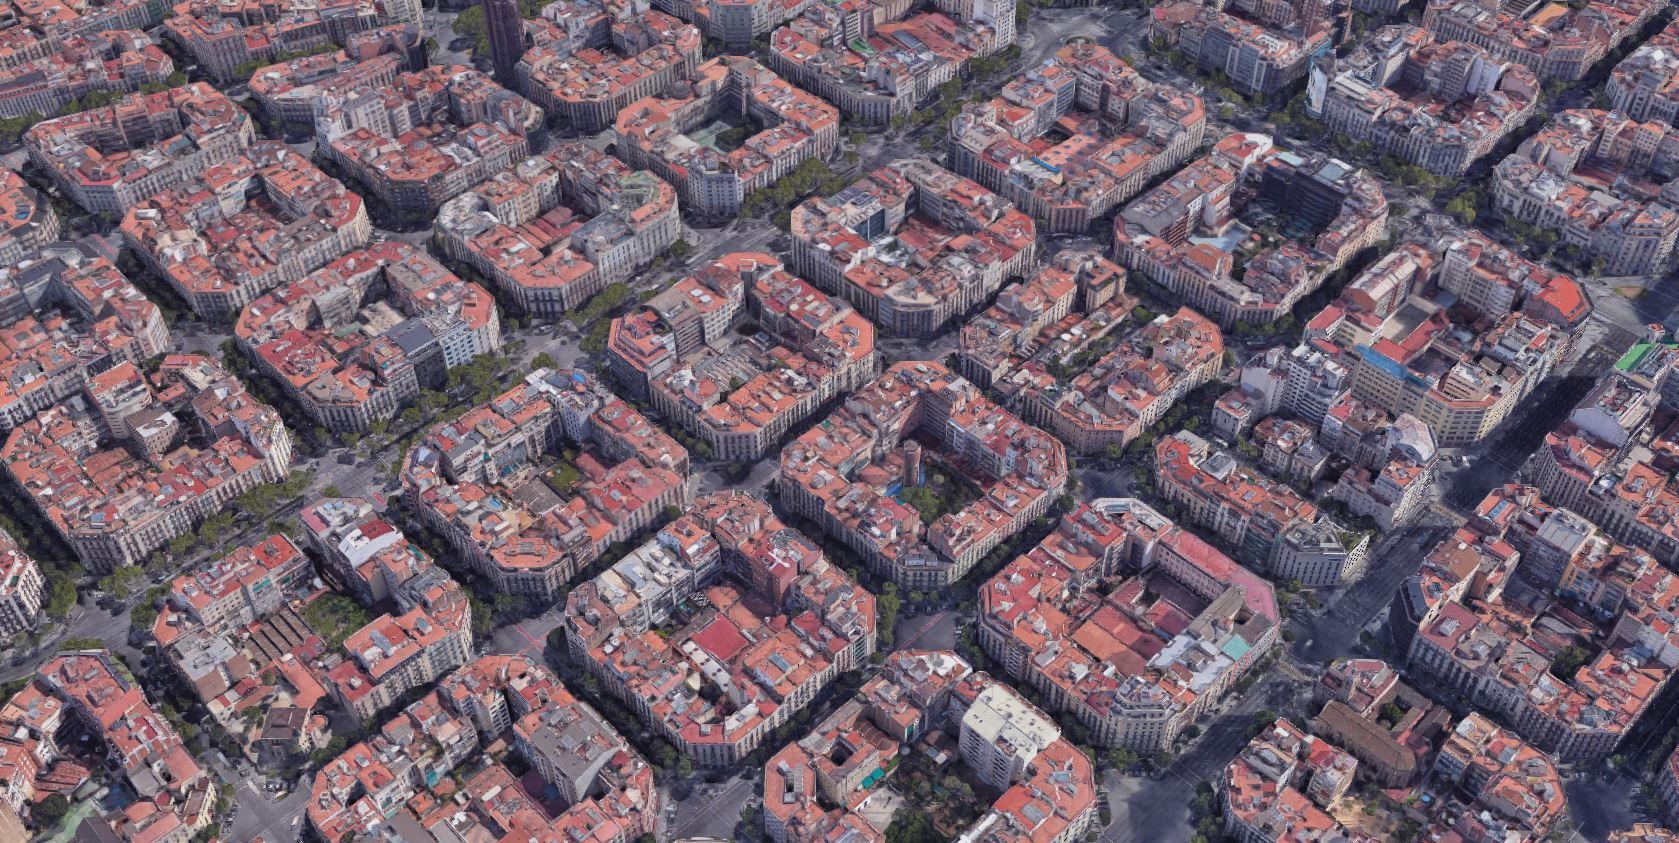 Vista aérea de Barcelona. Fuente - google